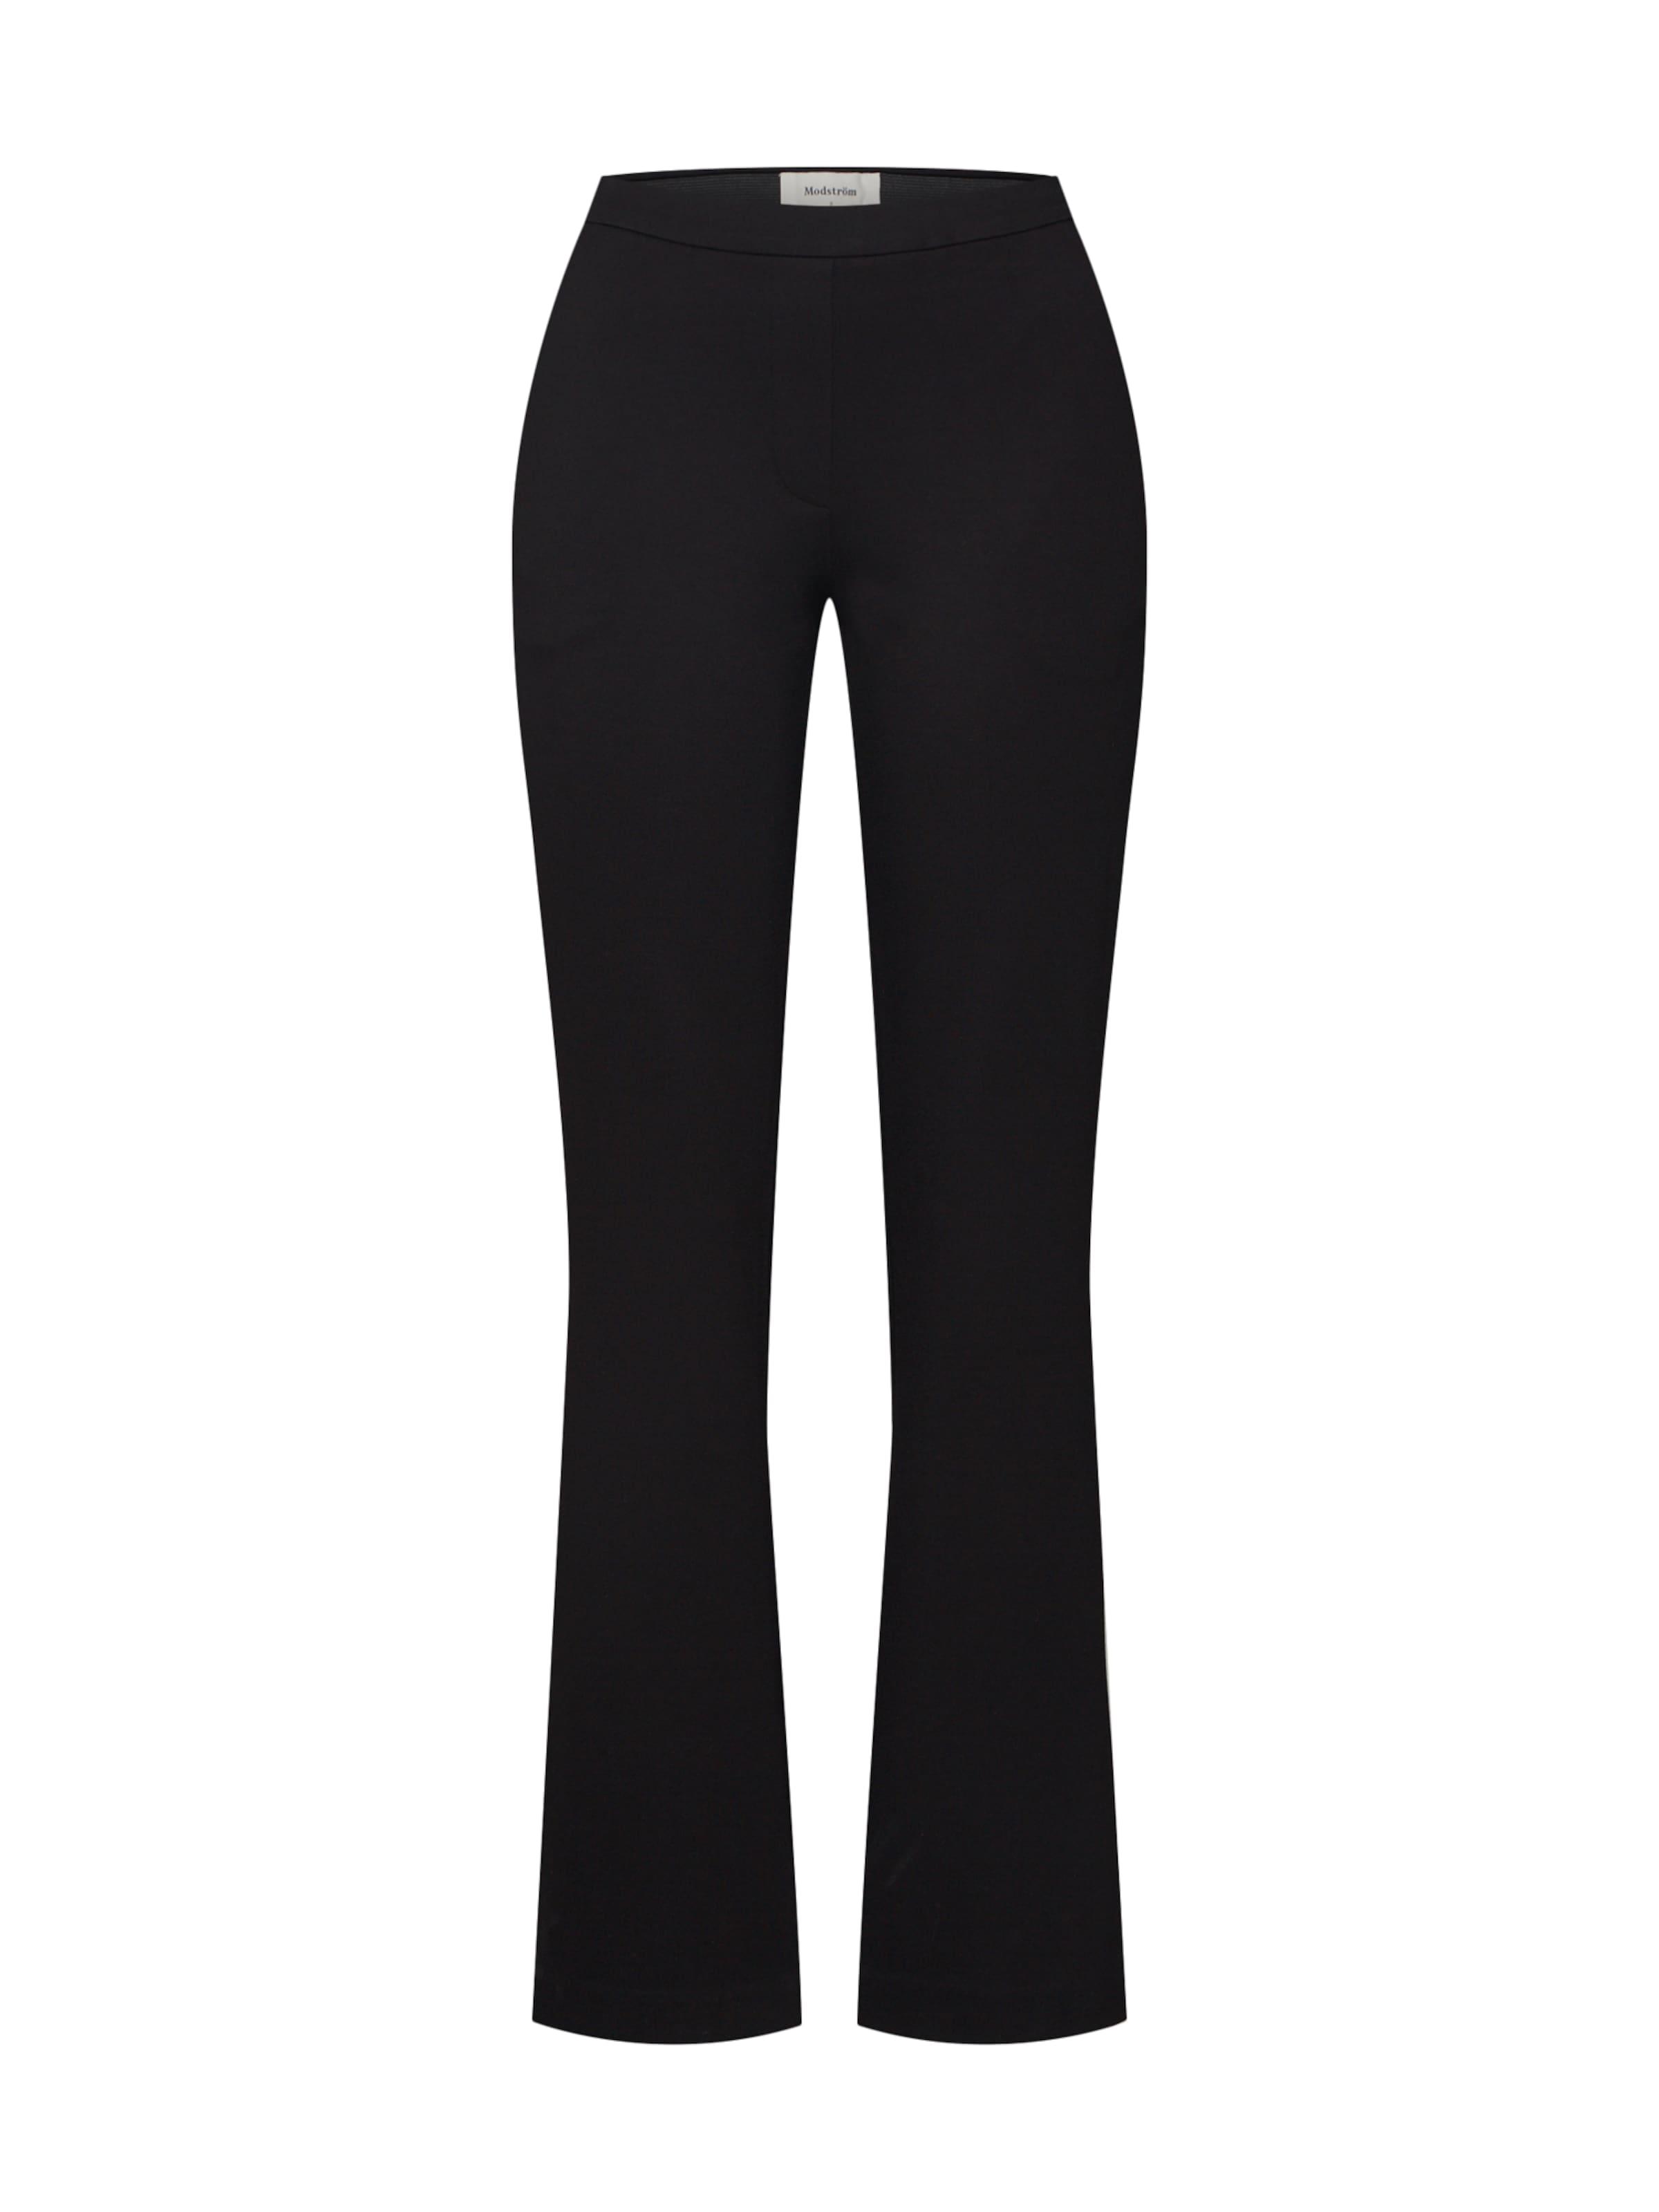 'tanny Pants' In Hose Schwarz Flare Modström wXn0P8Ok